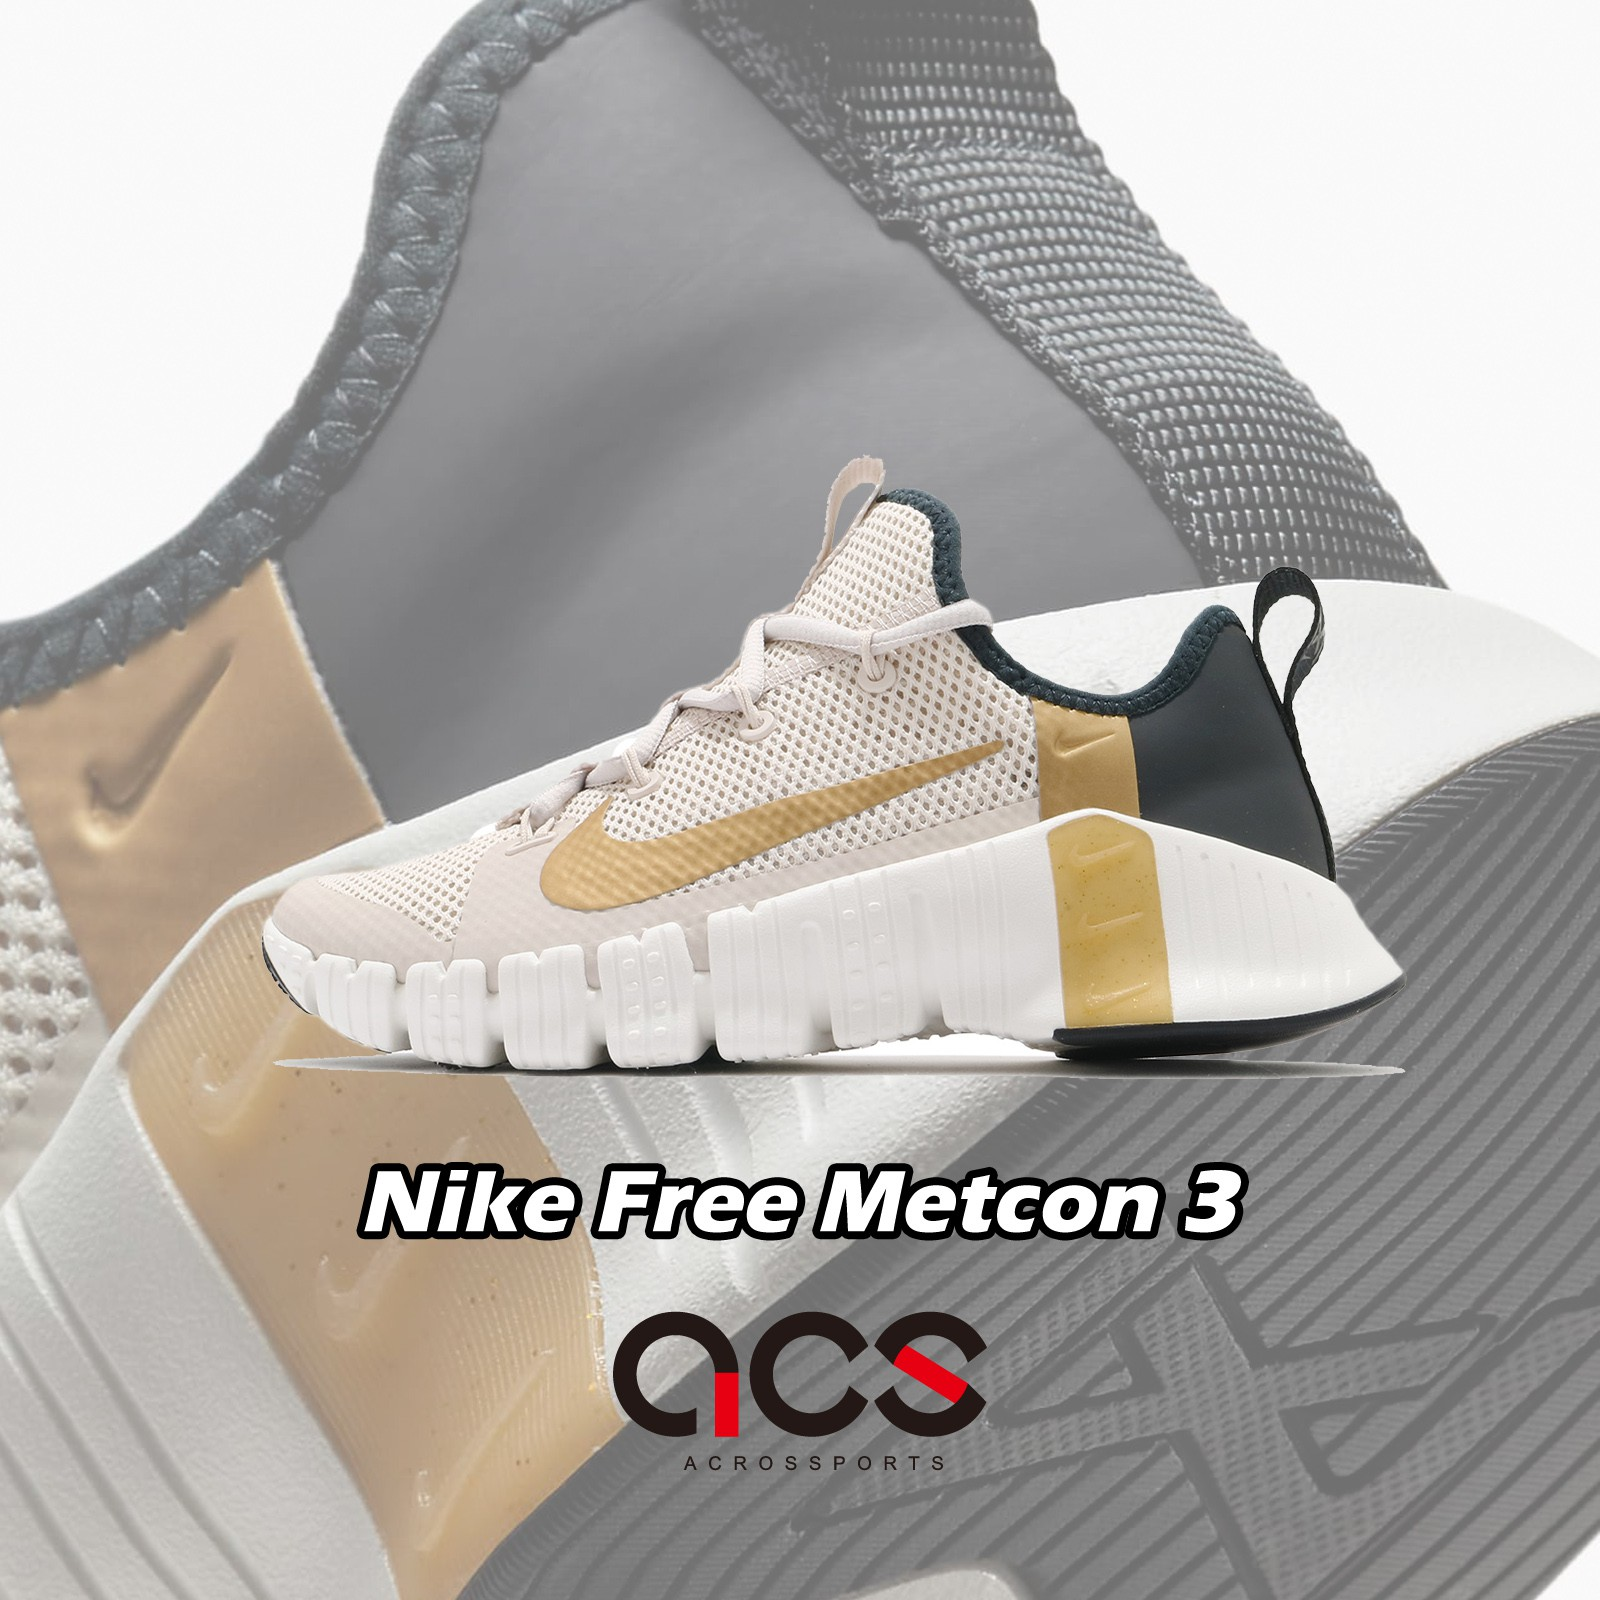 Nike 訓練鞋 Free Metcon 3 金 奶茶色 女鞋 健身專用 多功鞋運動鞋 【ACS】 CJ6314-170